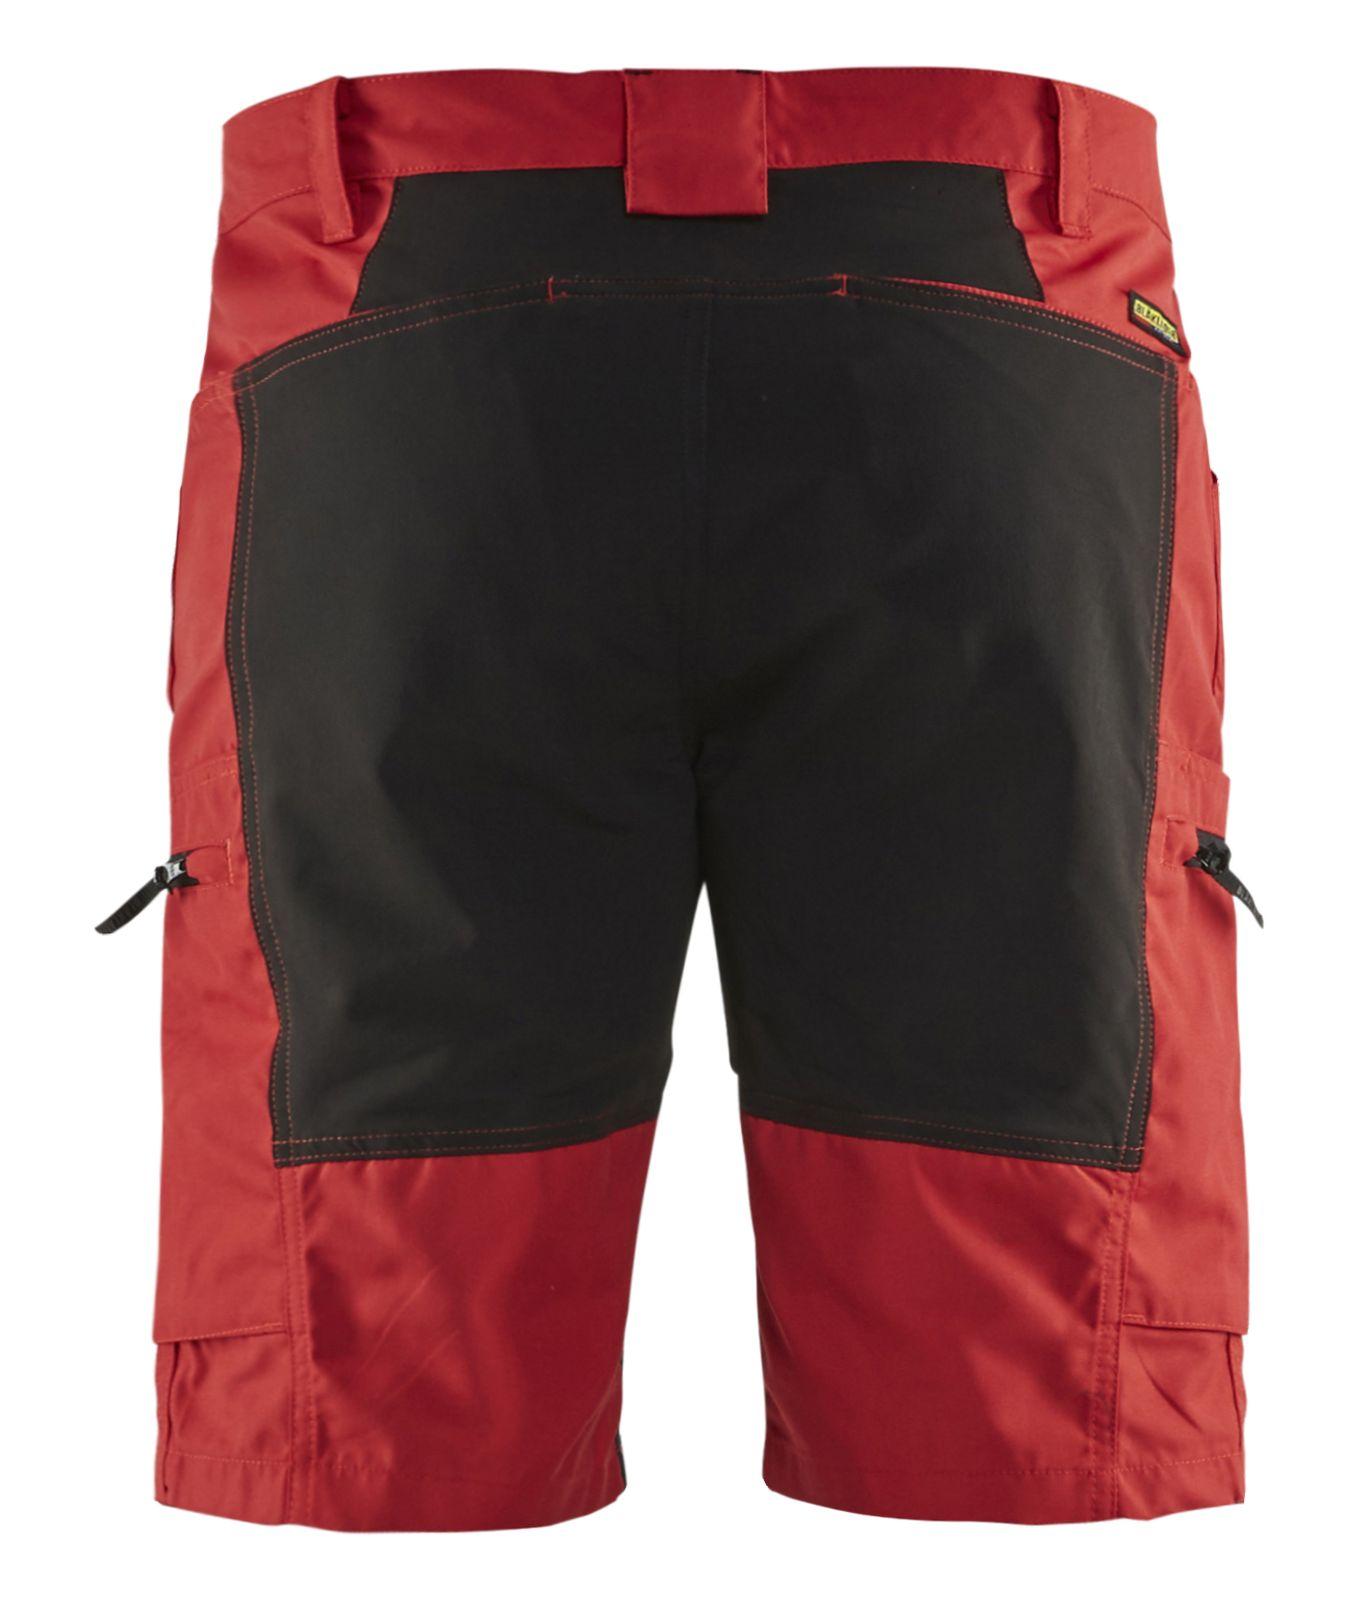 Blaklader Korte werkbroeken 14491845 met Stretch rood-zwart(5699)